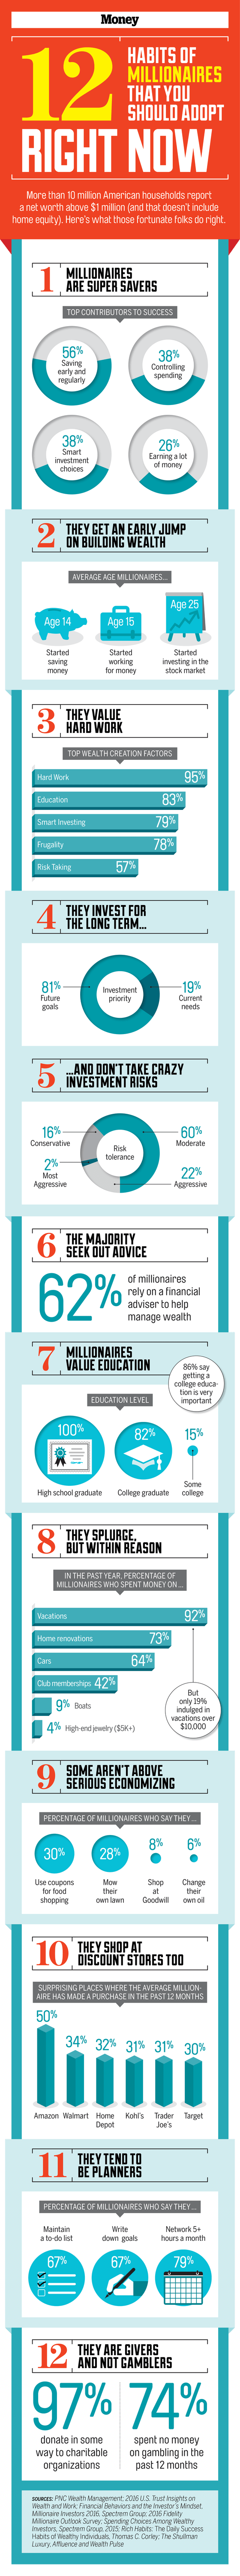 0823_graphic_12-habits-of-millionaires